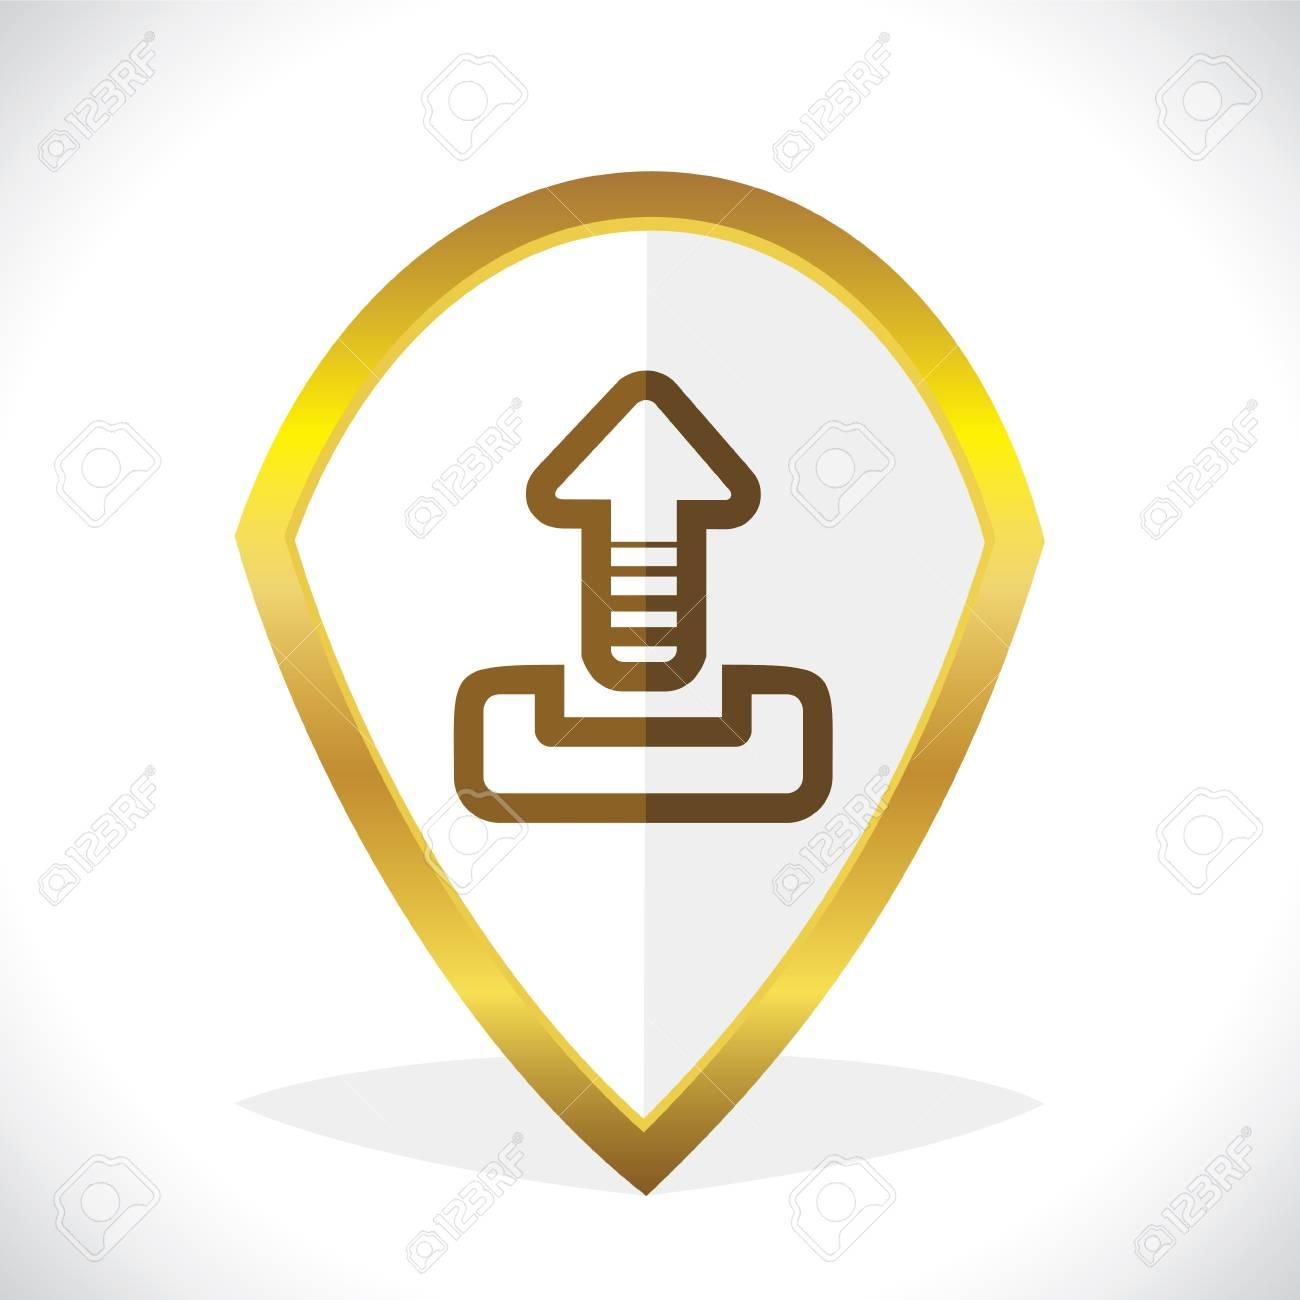 Uploading Icon Design Stock Vector Stock Vector - 17216234